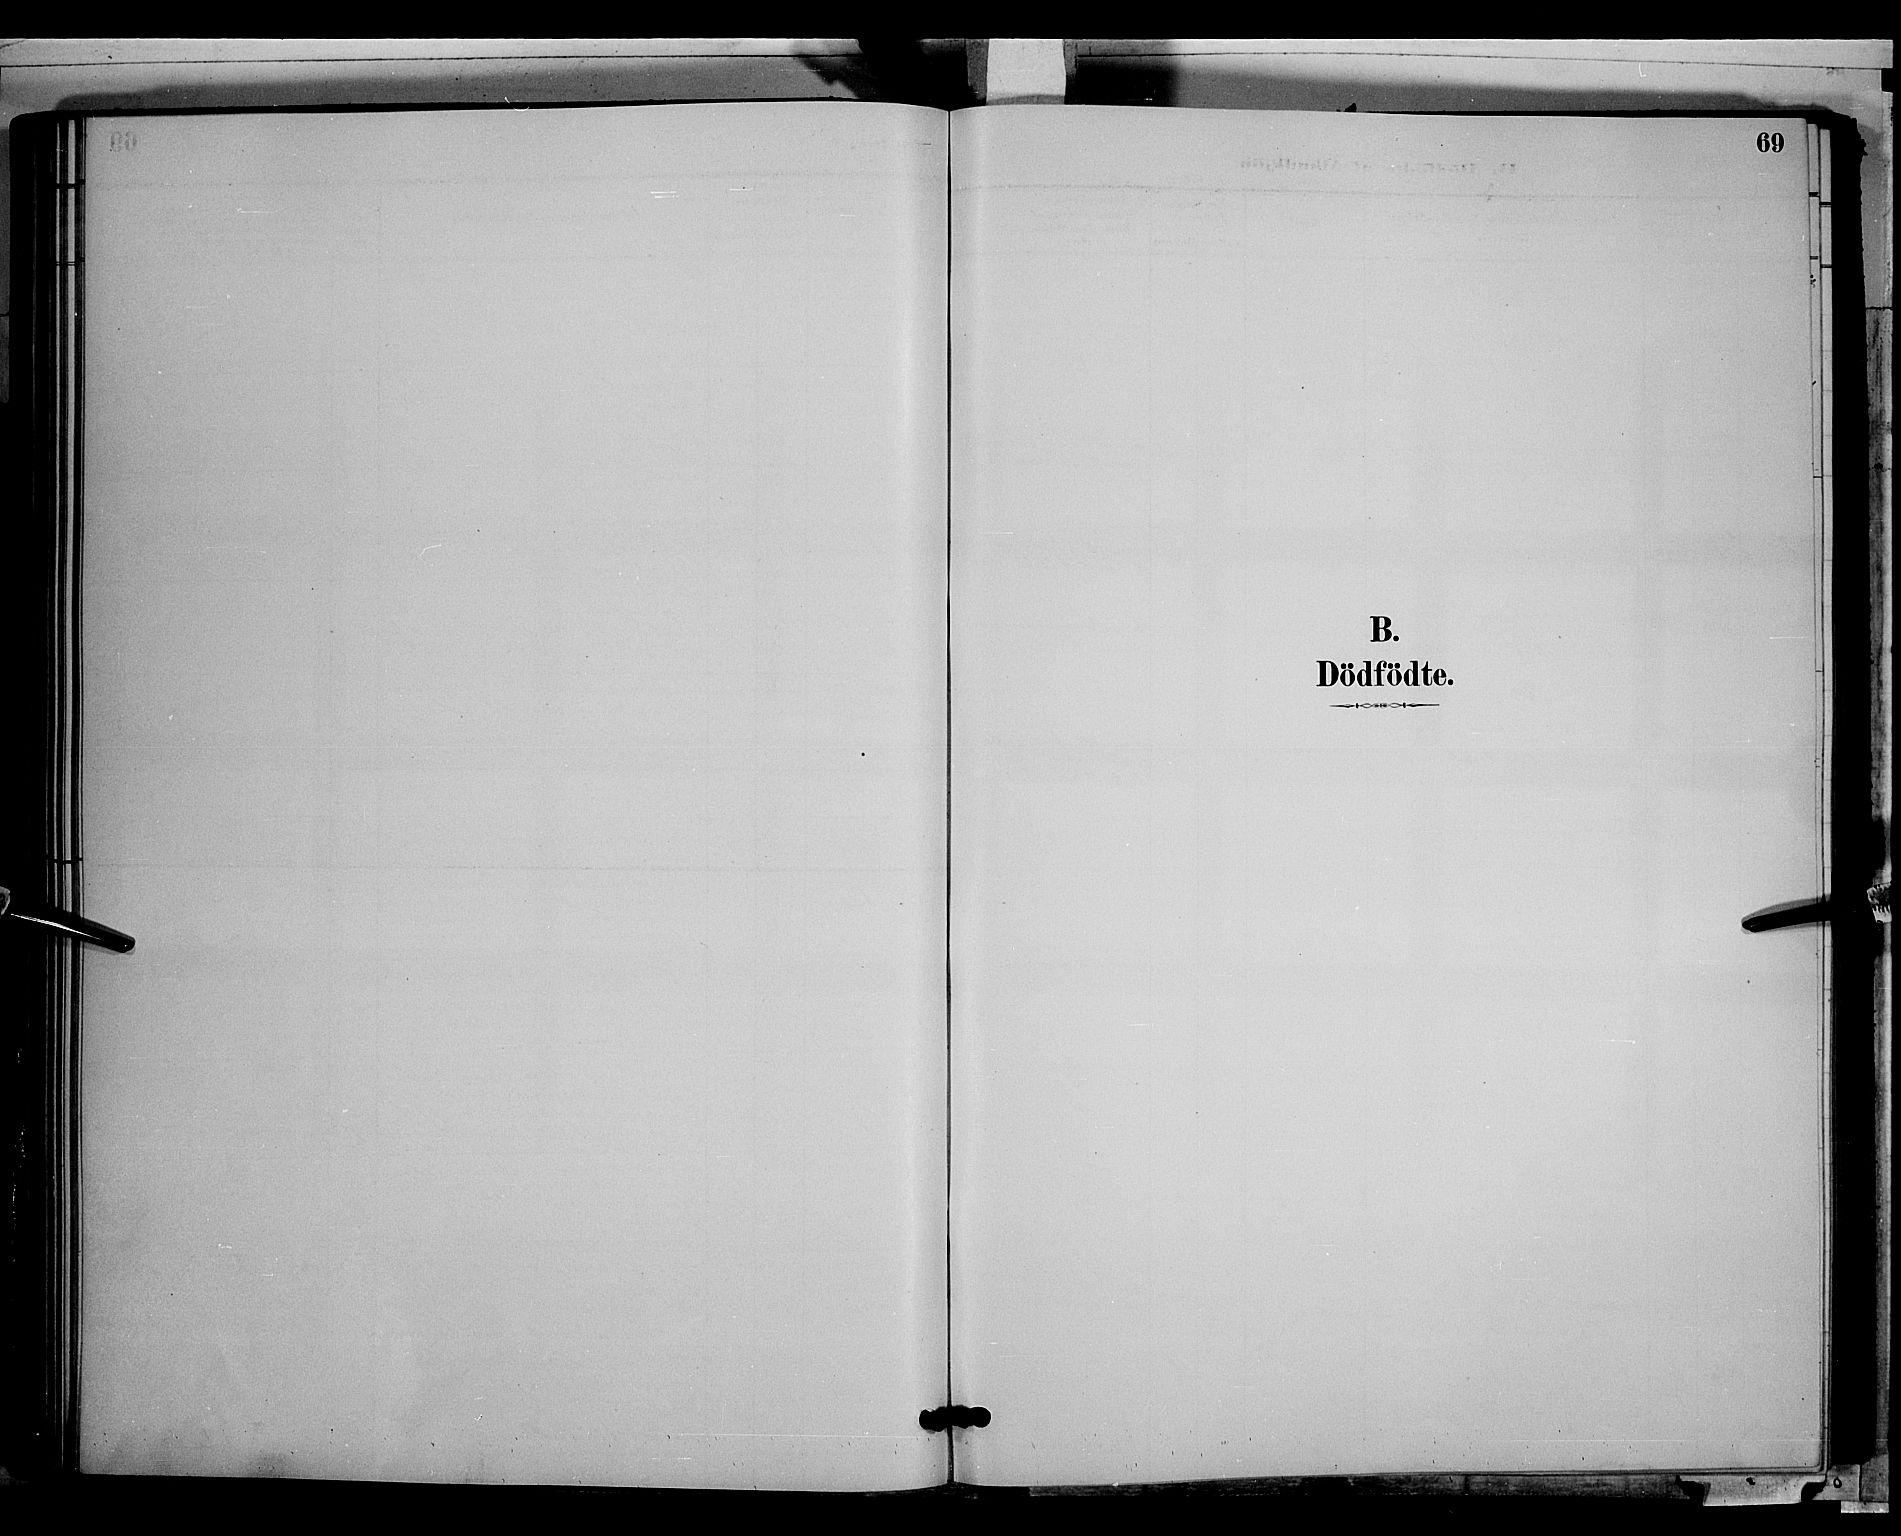 SAH, Søndre Land prestekontor, L/L0003: Klokkerbok nr. 3, 1884-1902, s. 69